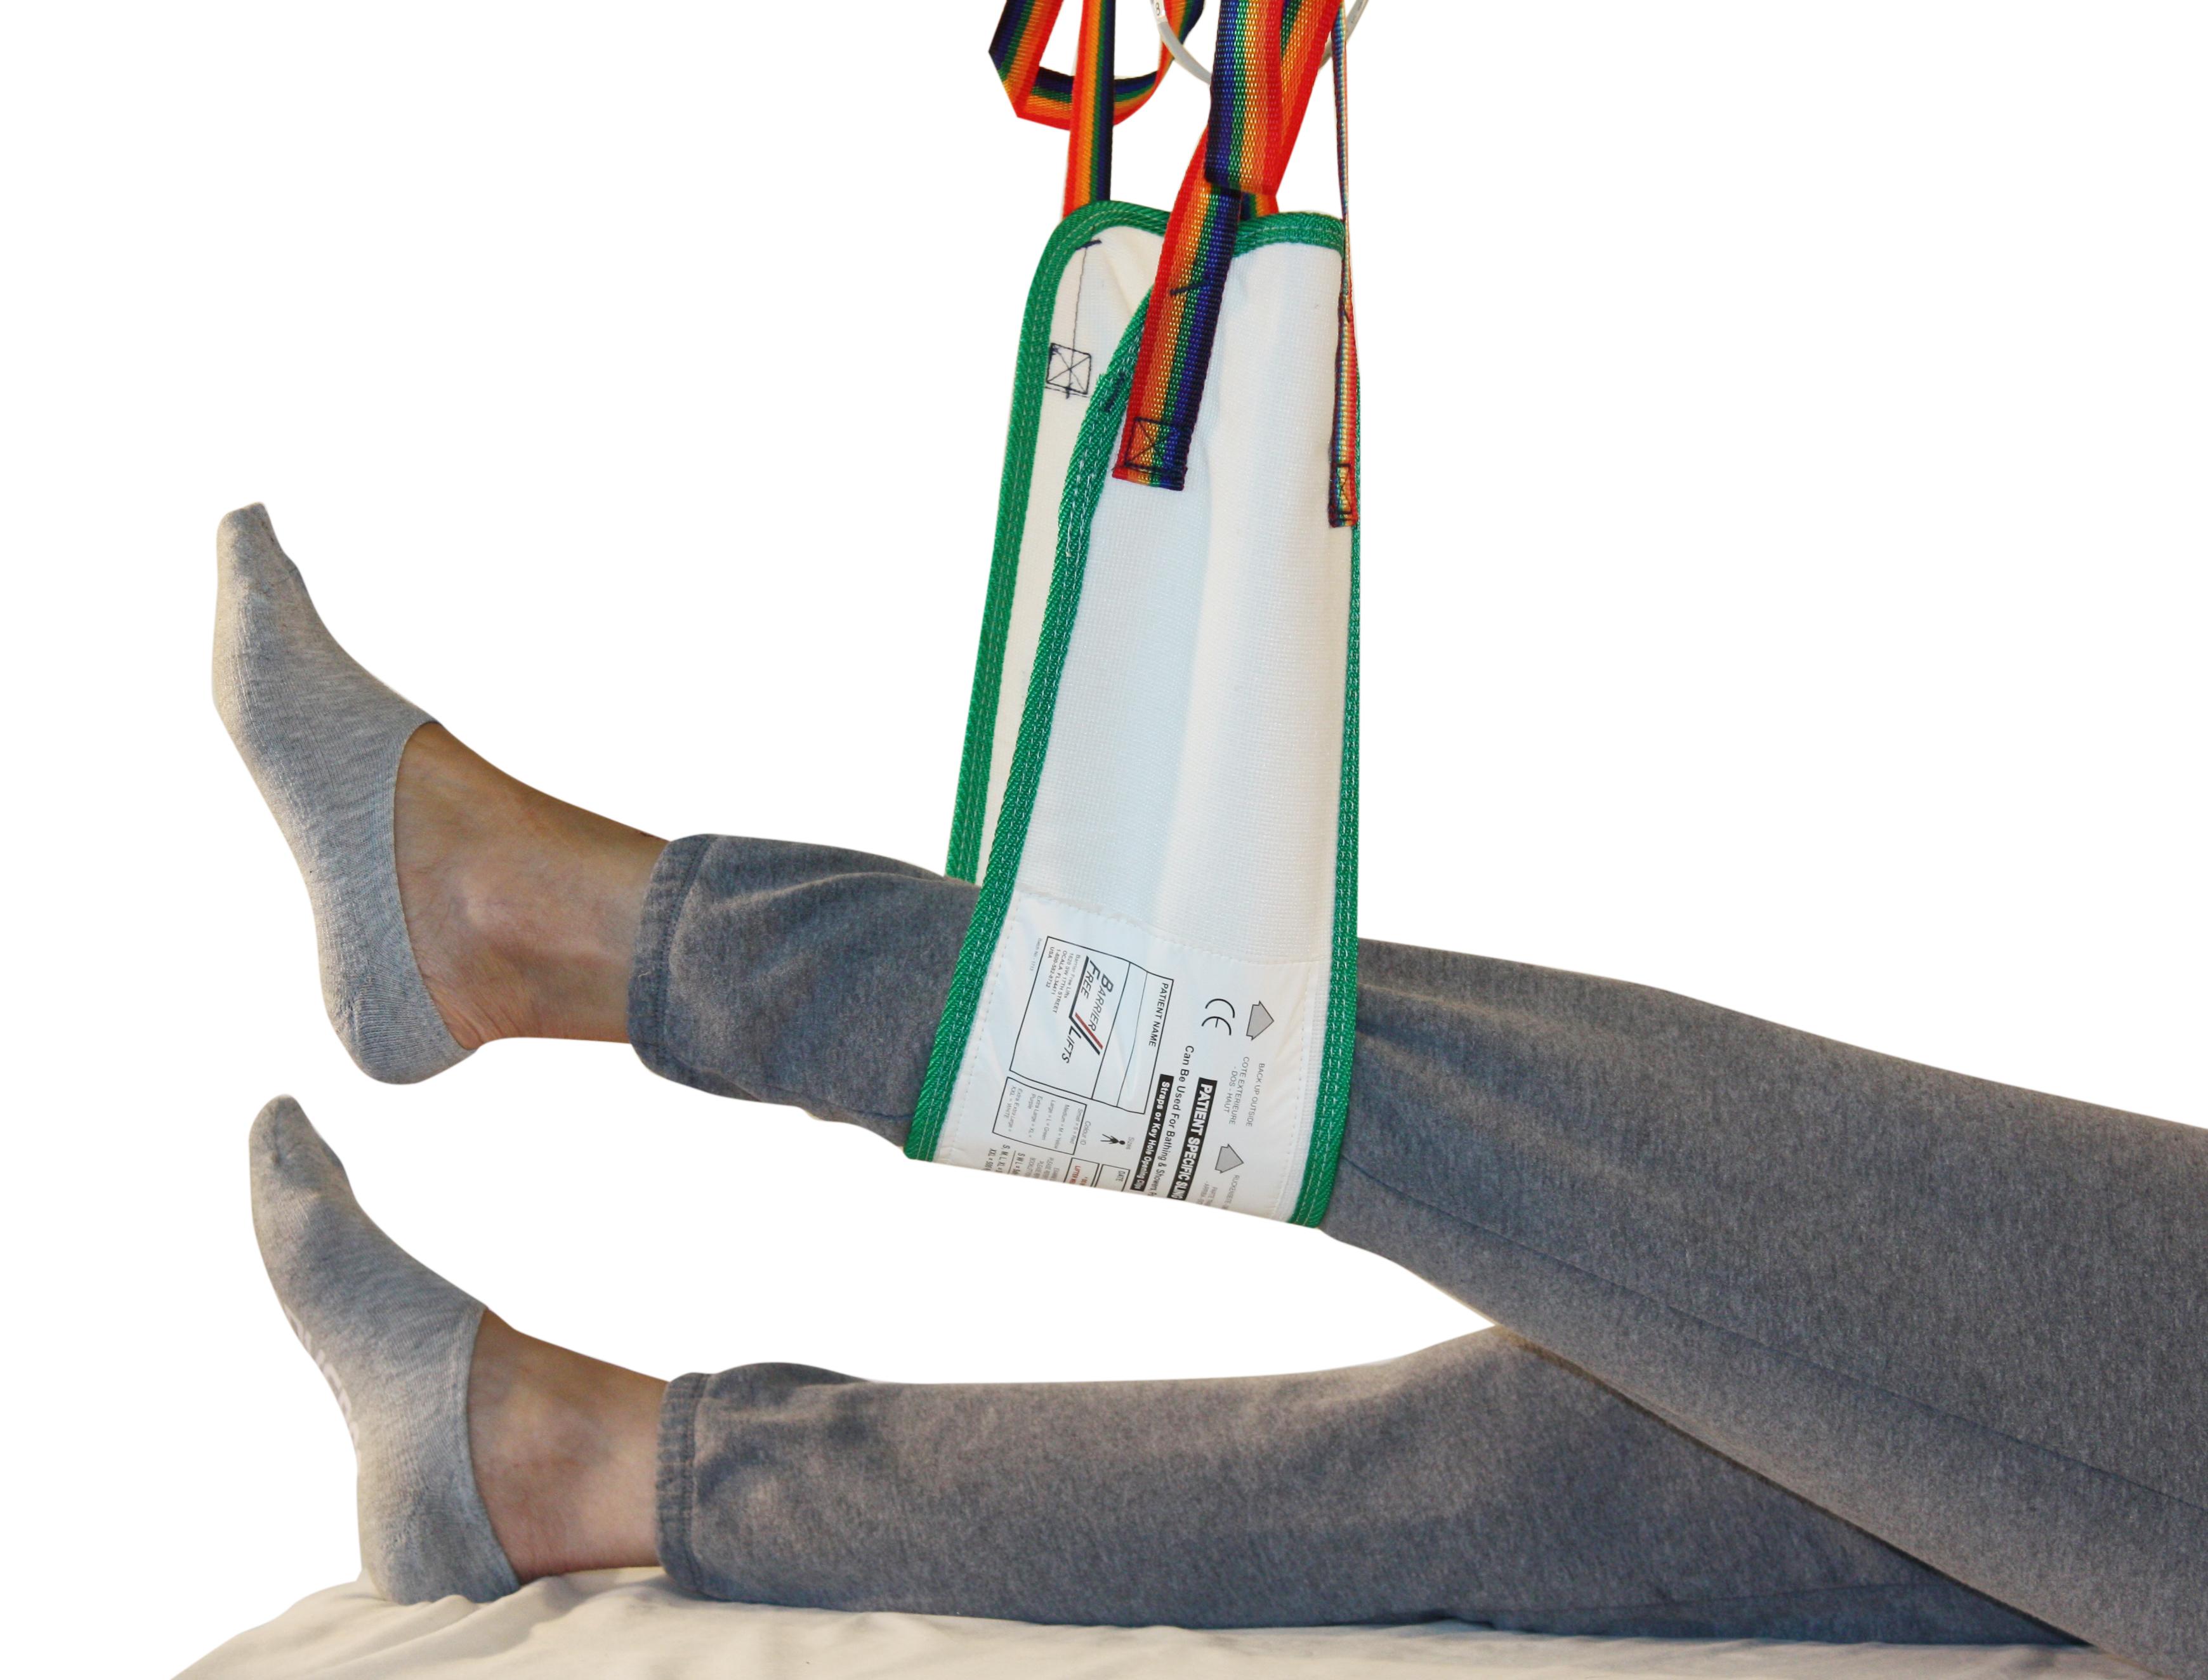 1 Disp Limb Lifter